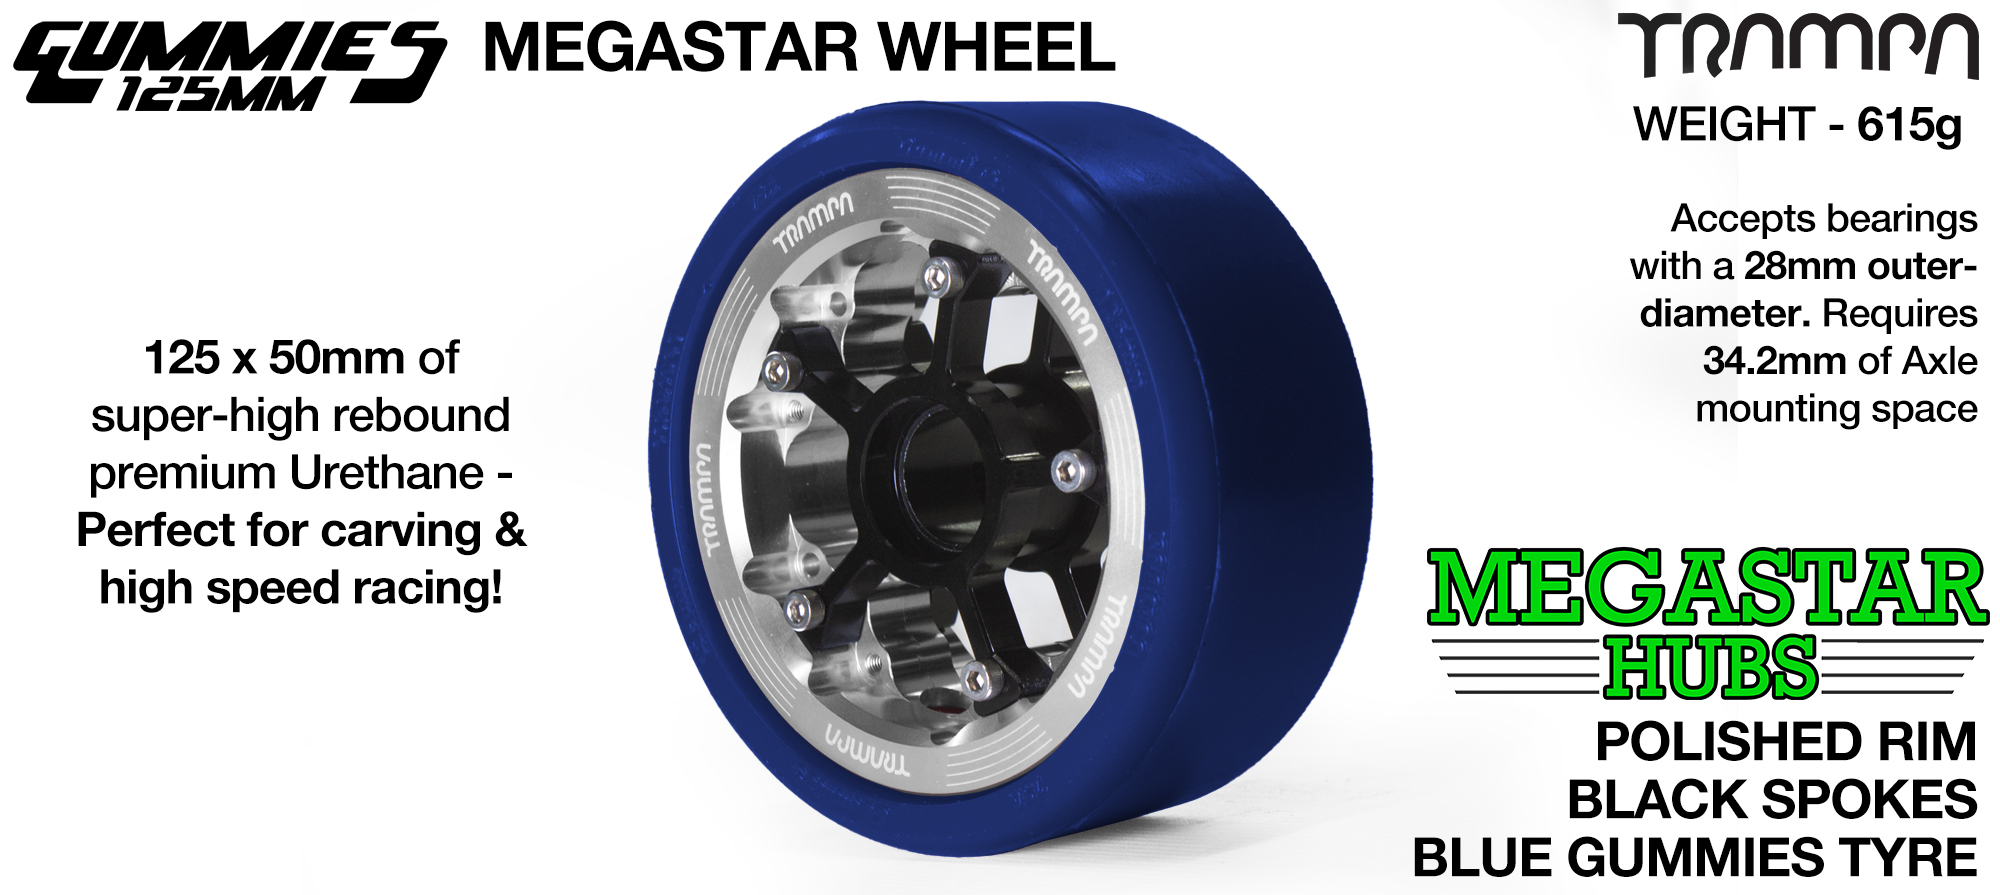 POLISHED MEGASTAR Rim with RED Spokes & BLACK Gummies - The Ulrimate Longboard Wheel